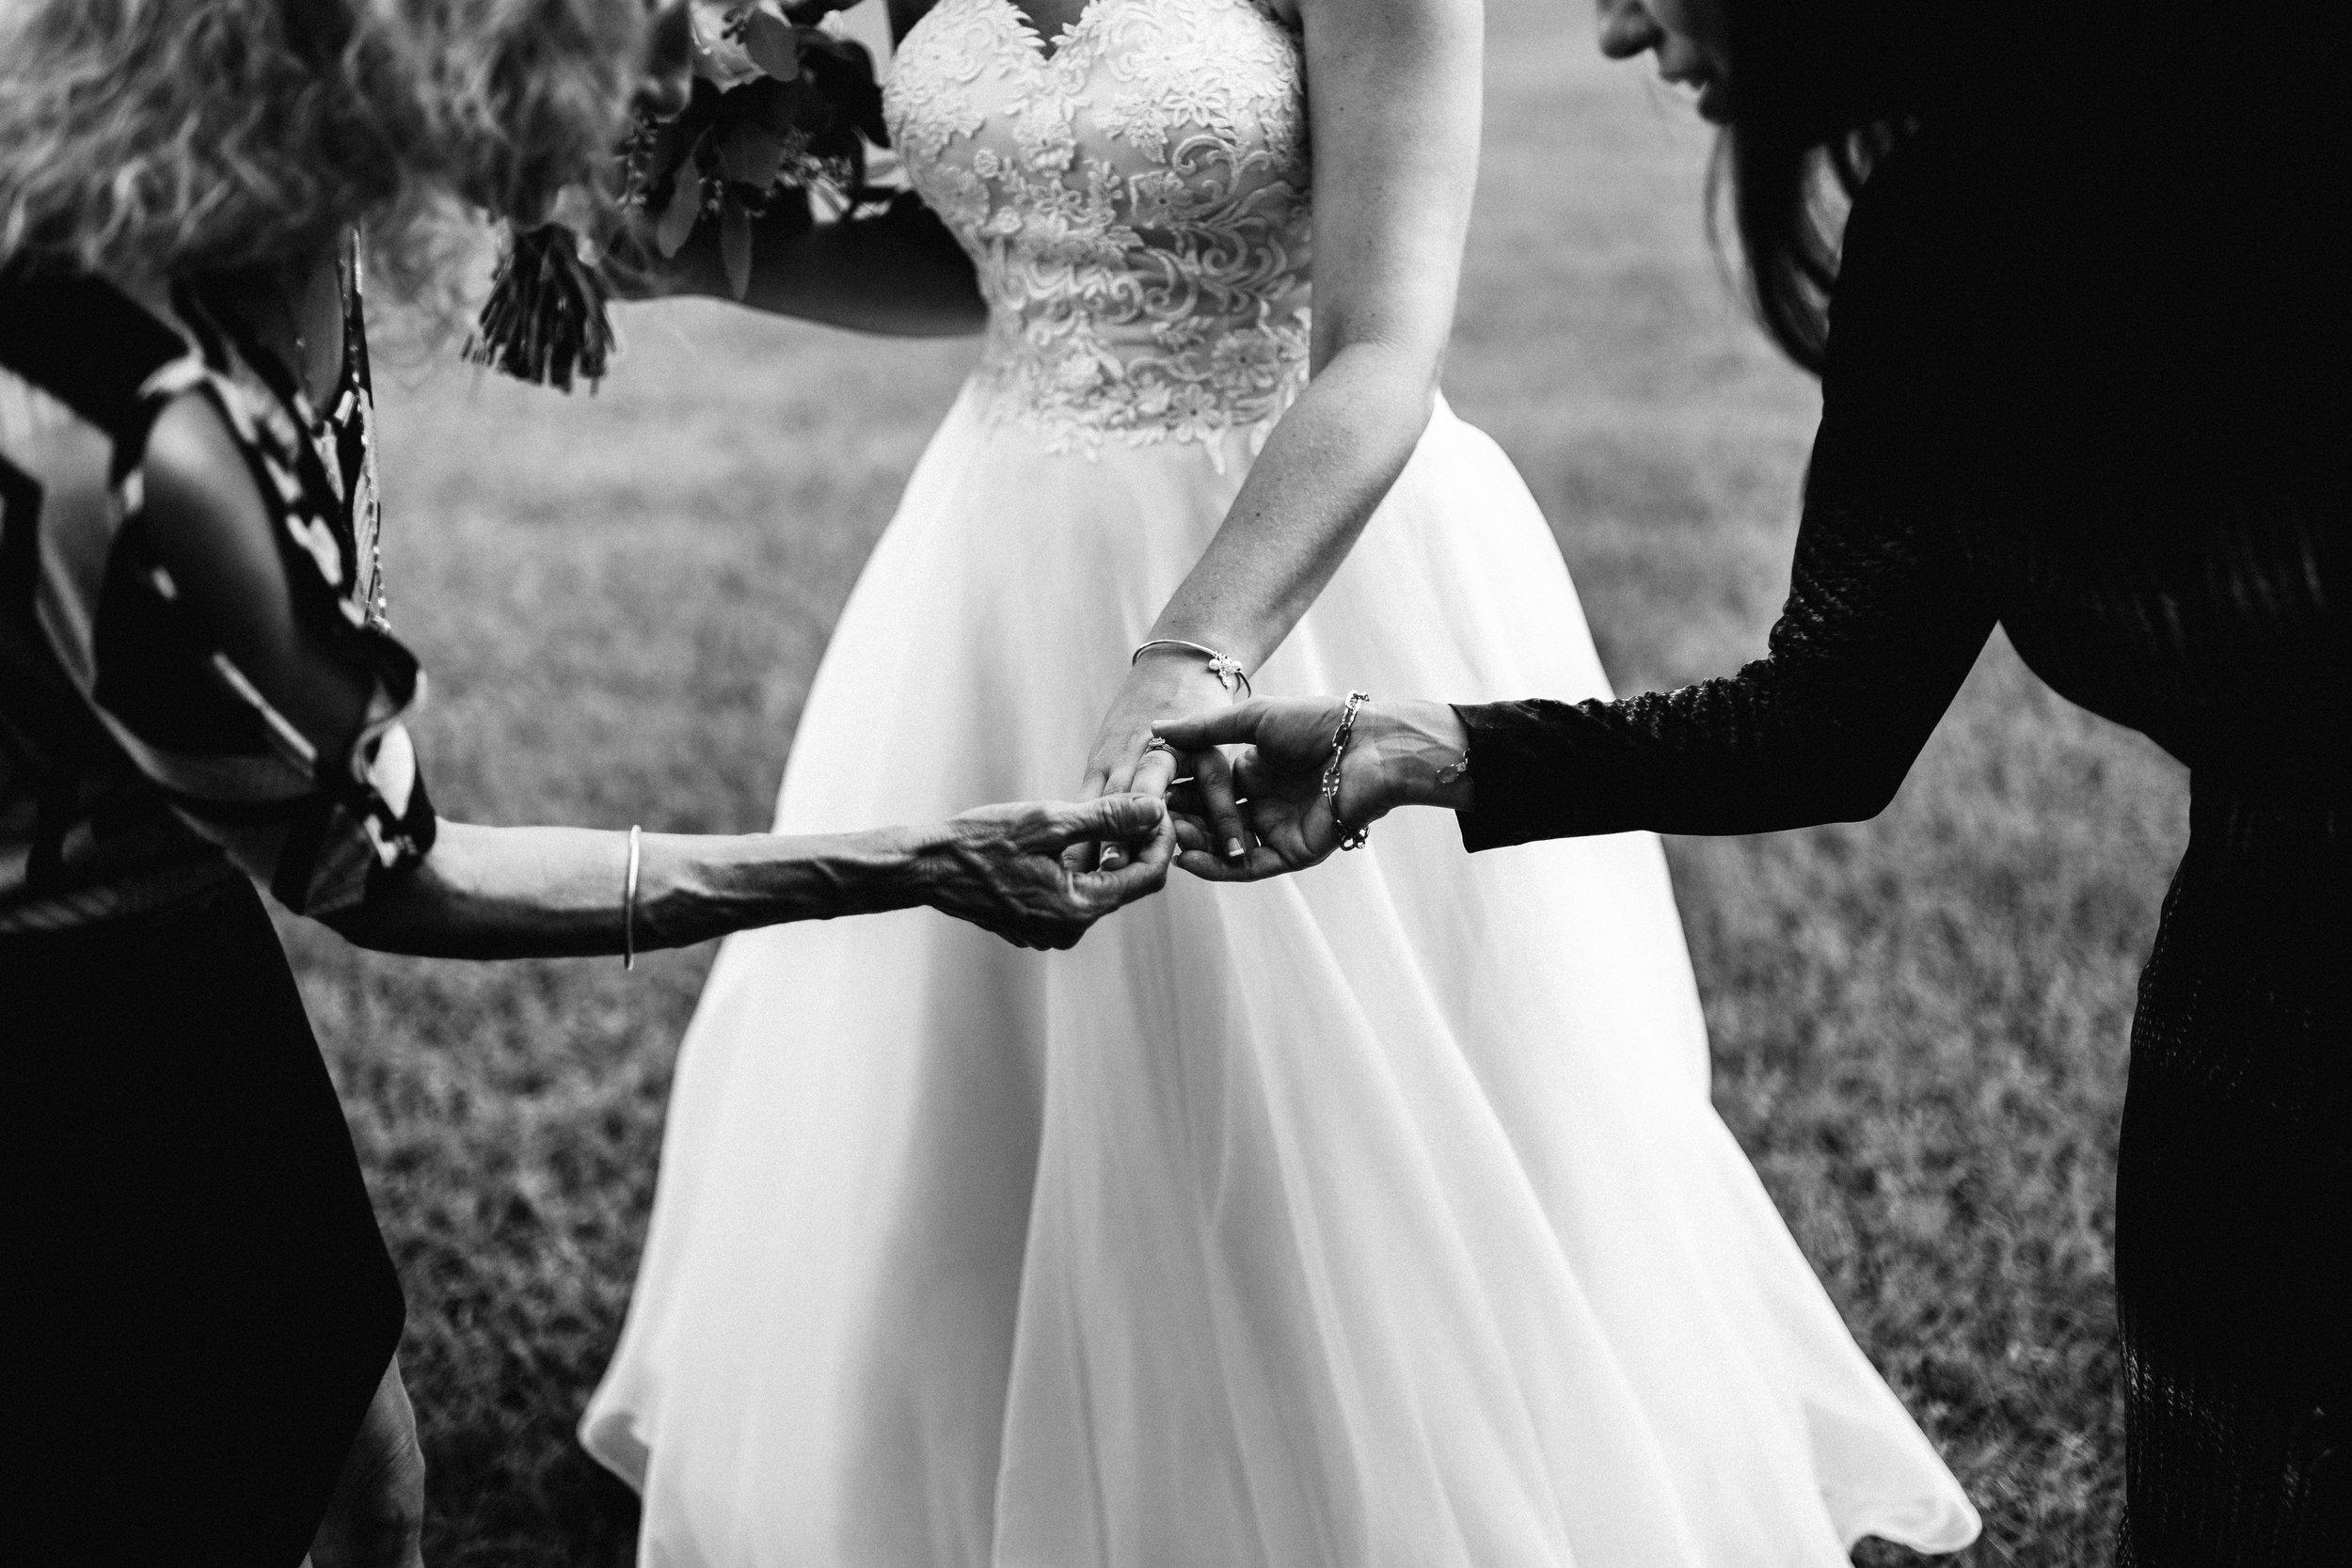 2017.10.14 Samantha and Matthew Crabtree Sarasota Wedding (239 of 708).jpg